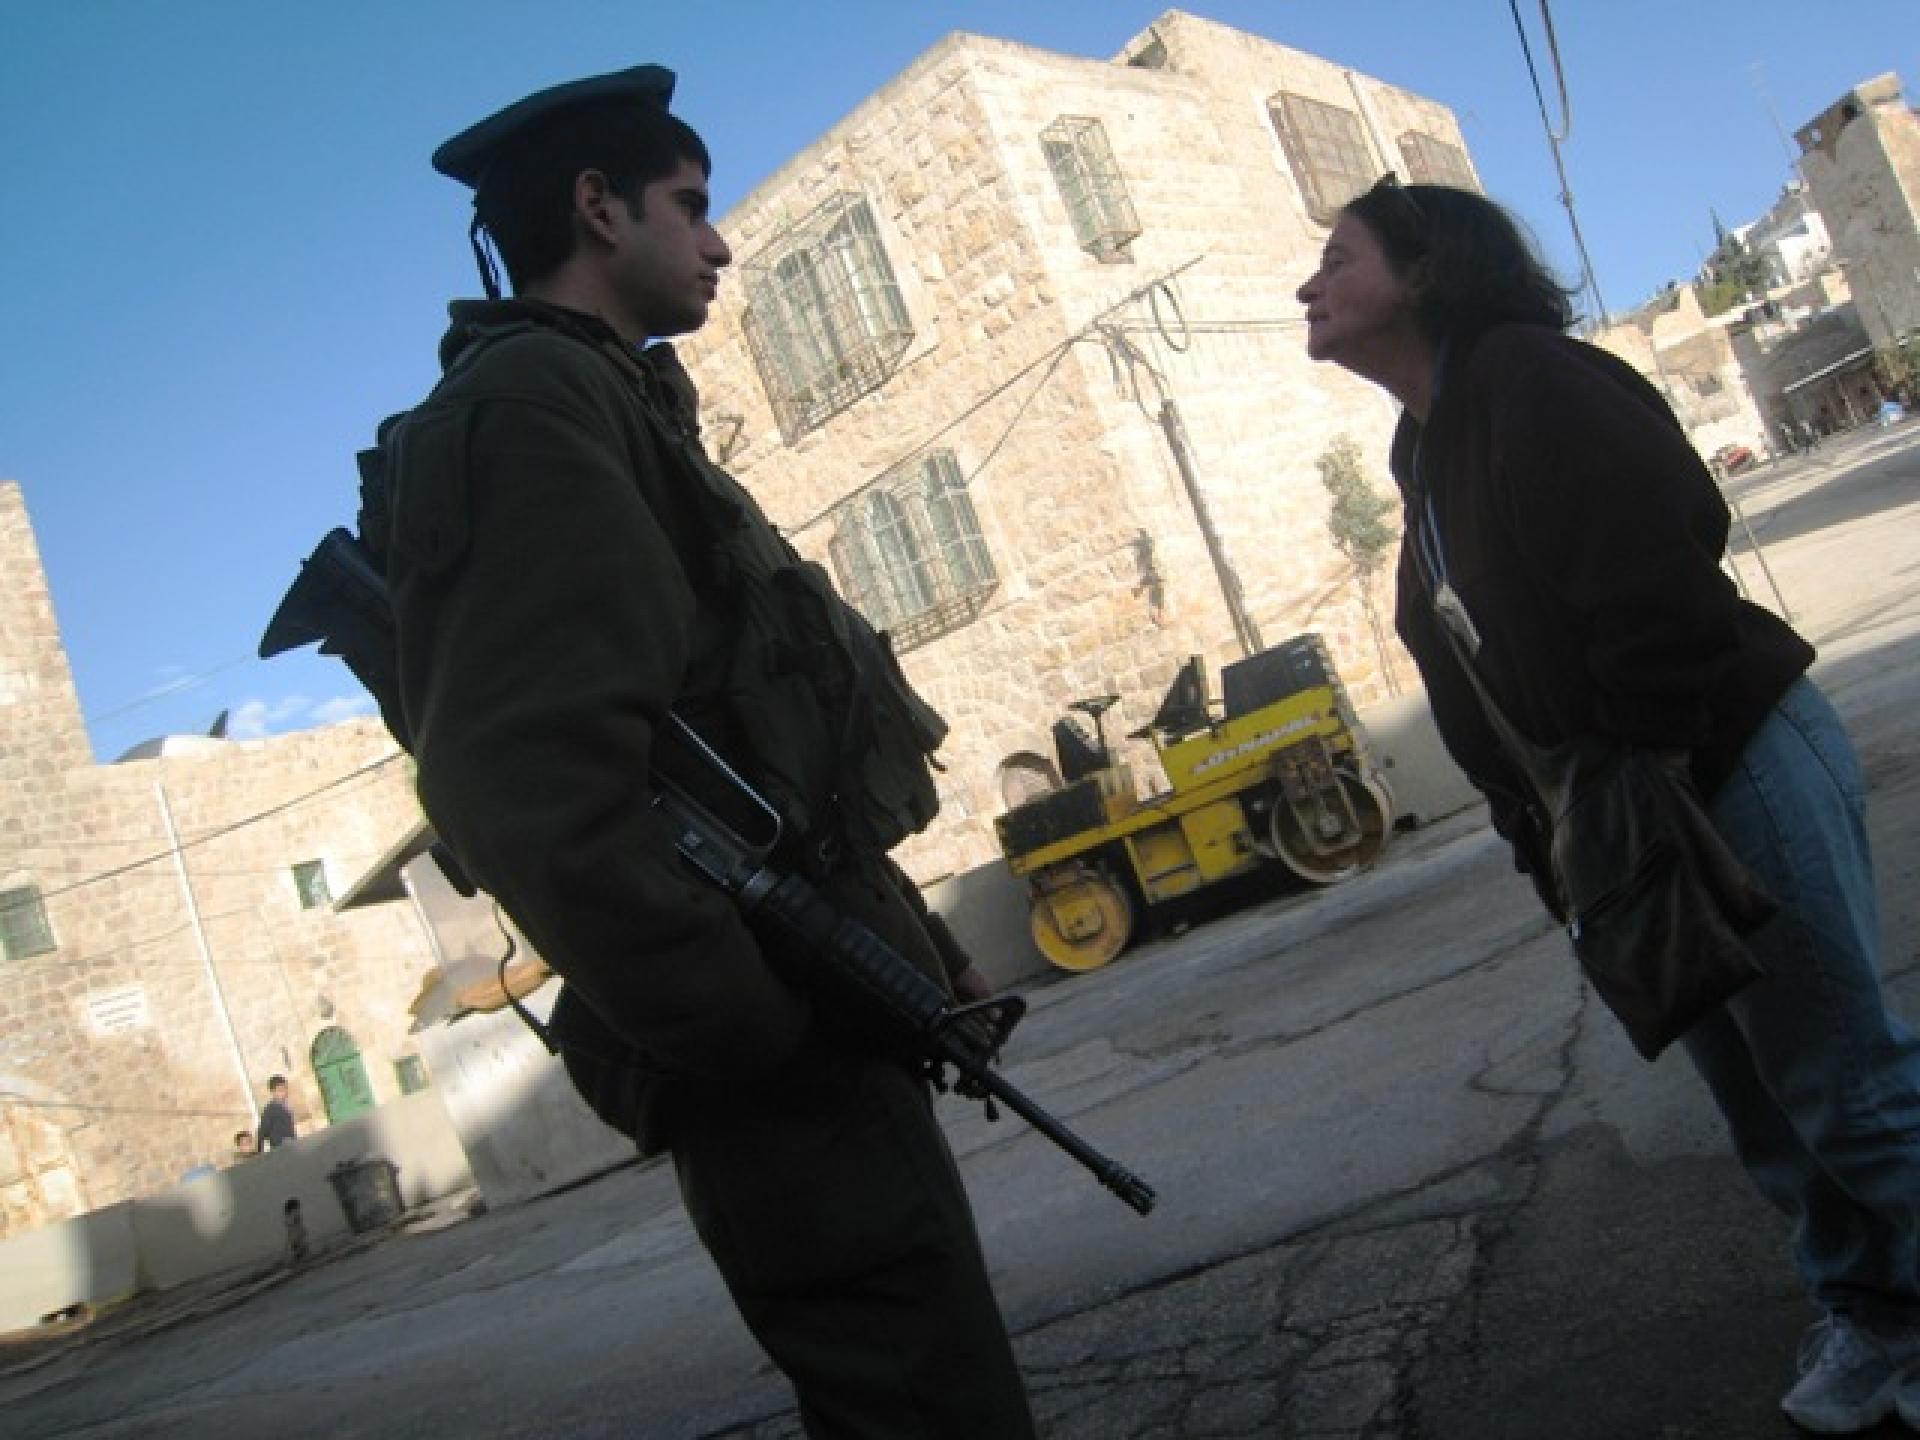 Hebron 14.01.10